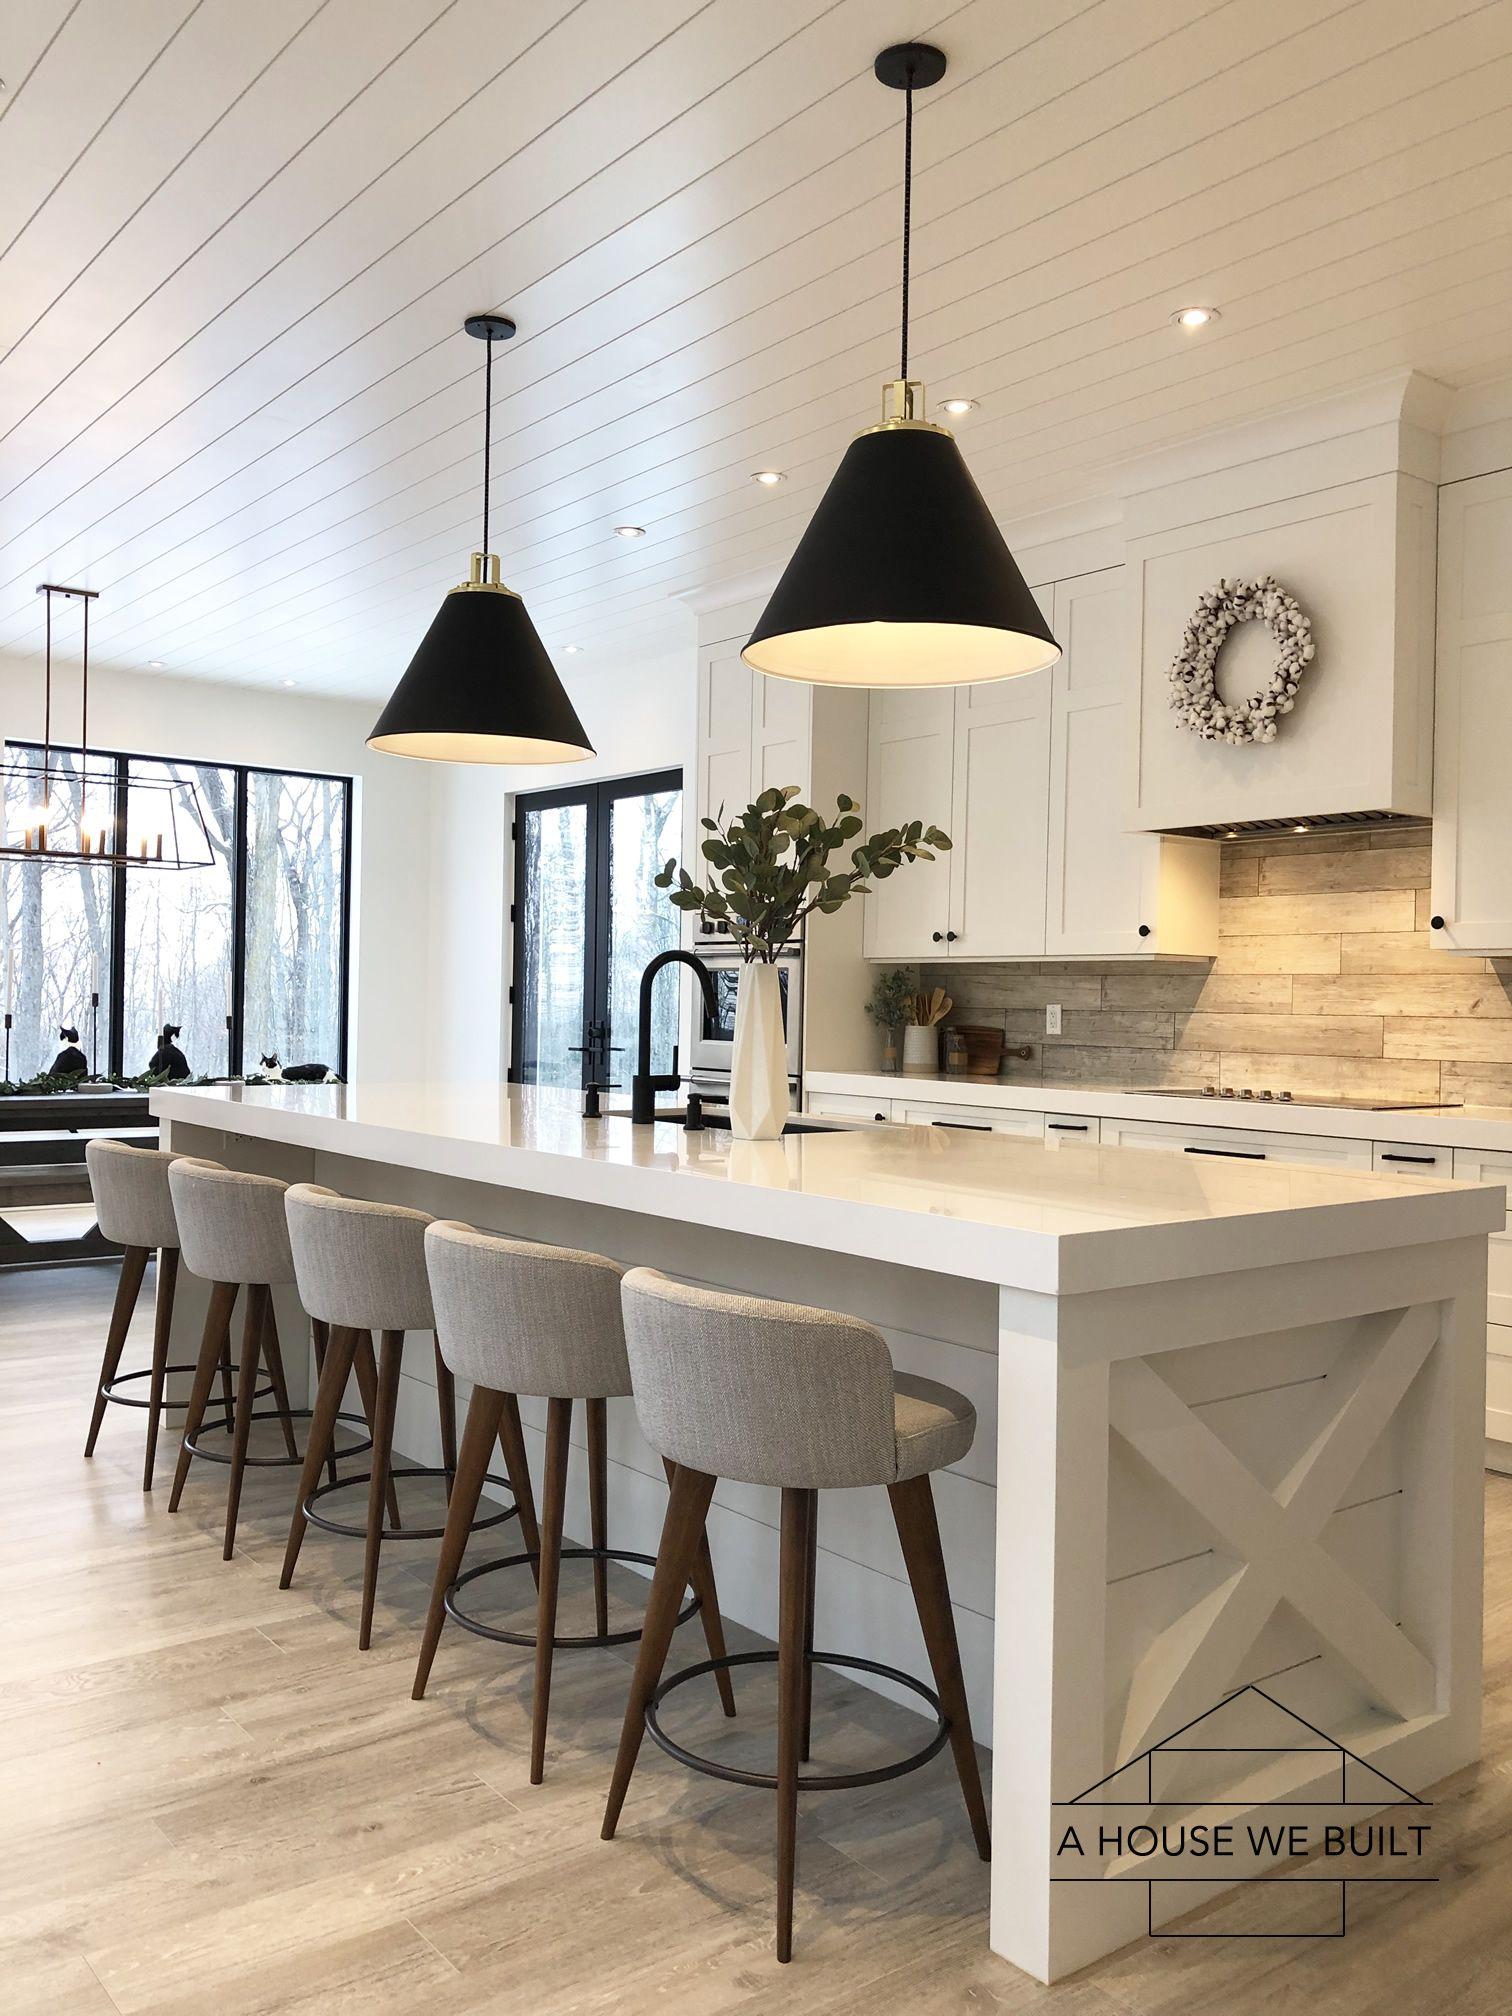 Custom House Designed by Husband & Wife Team | Modern Farmhouse Inspired